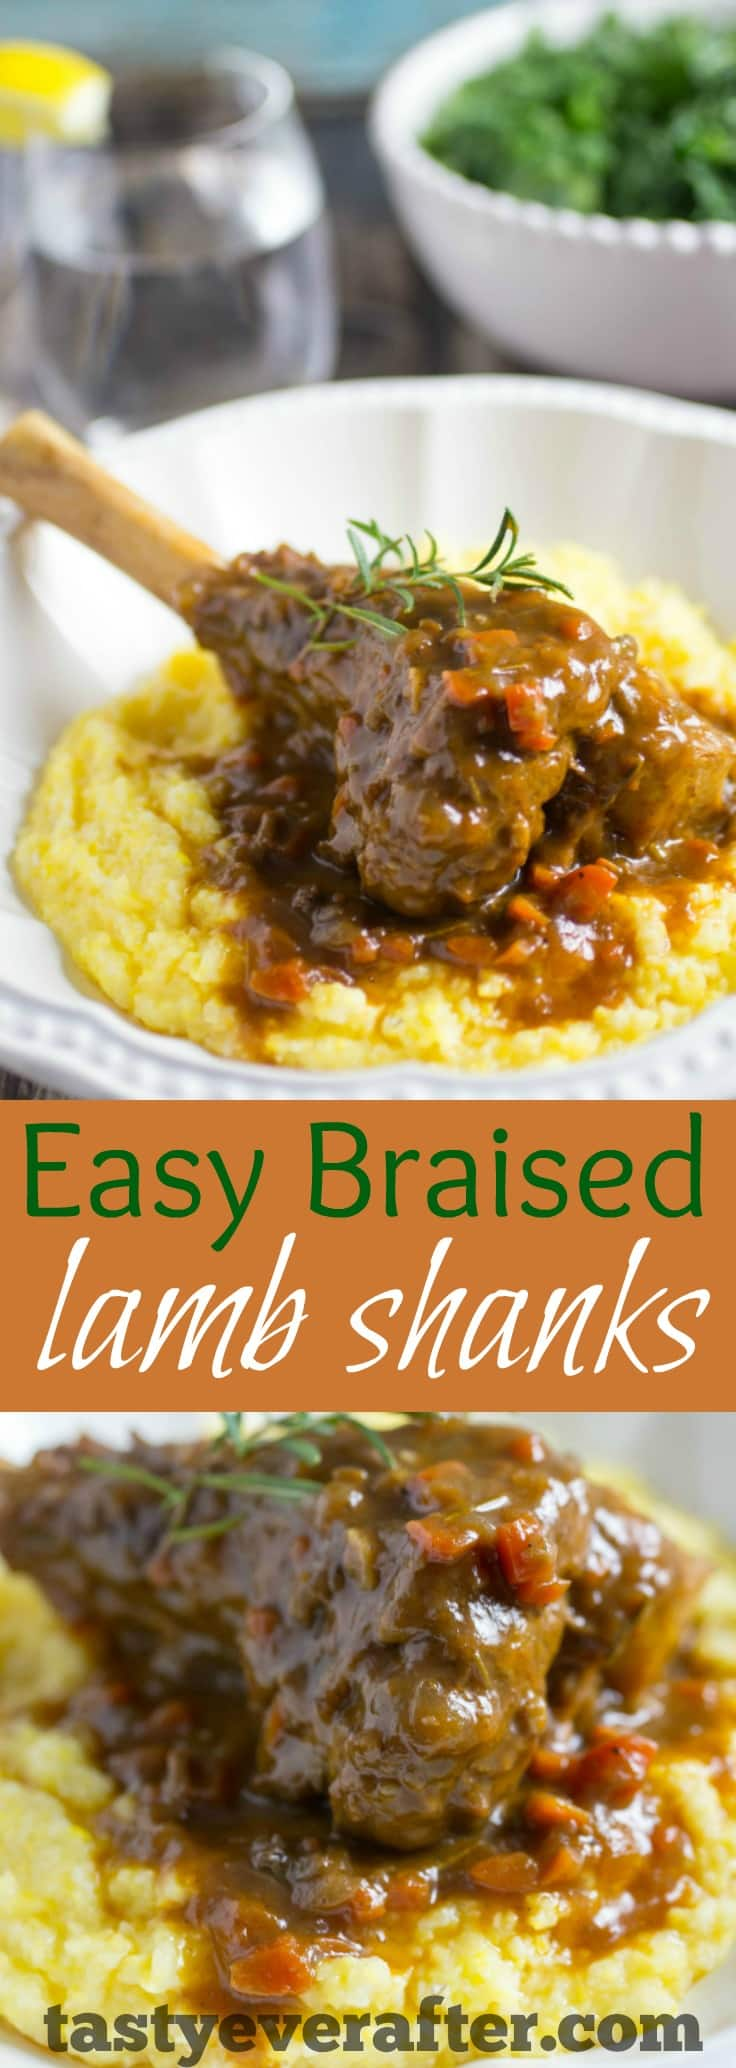 EasyBraisedLambShanksPIN - Easy Braised Lamb Shanks Recipe